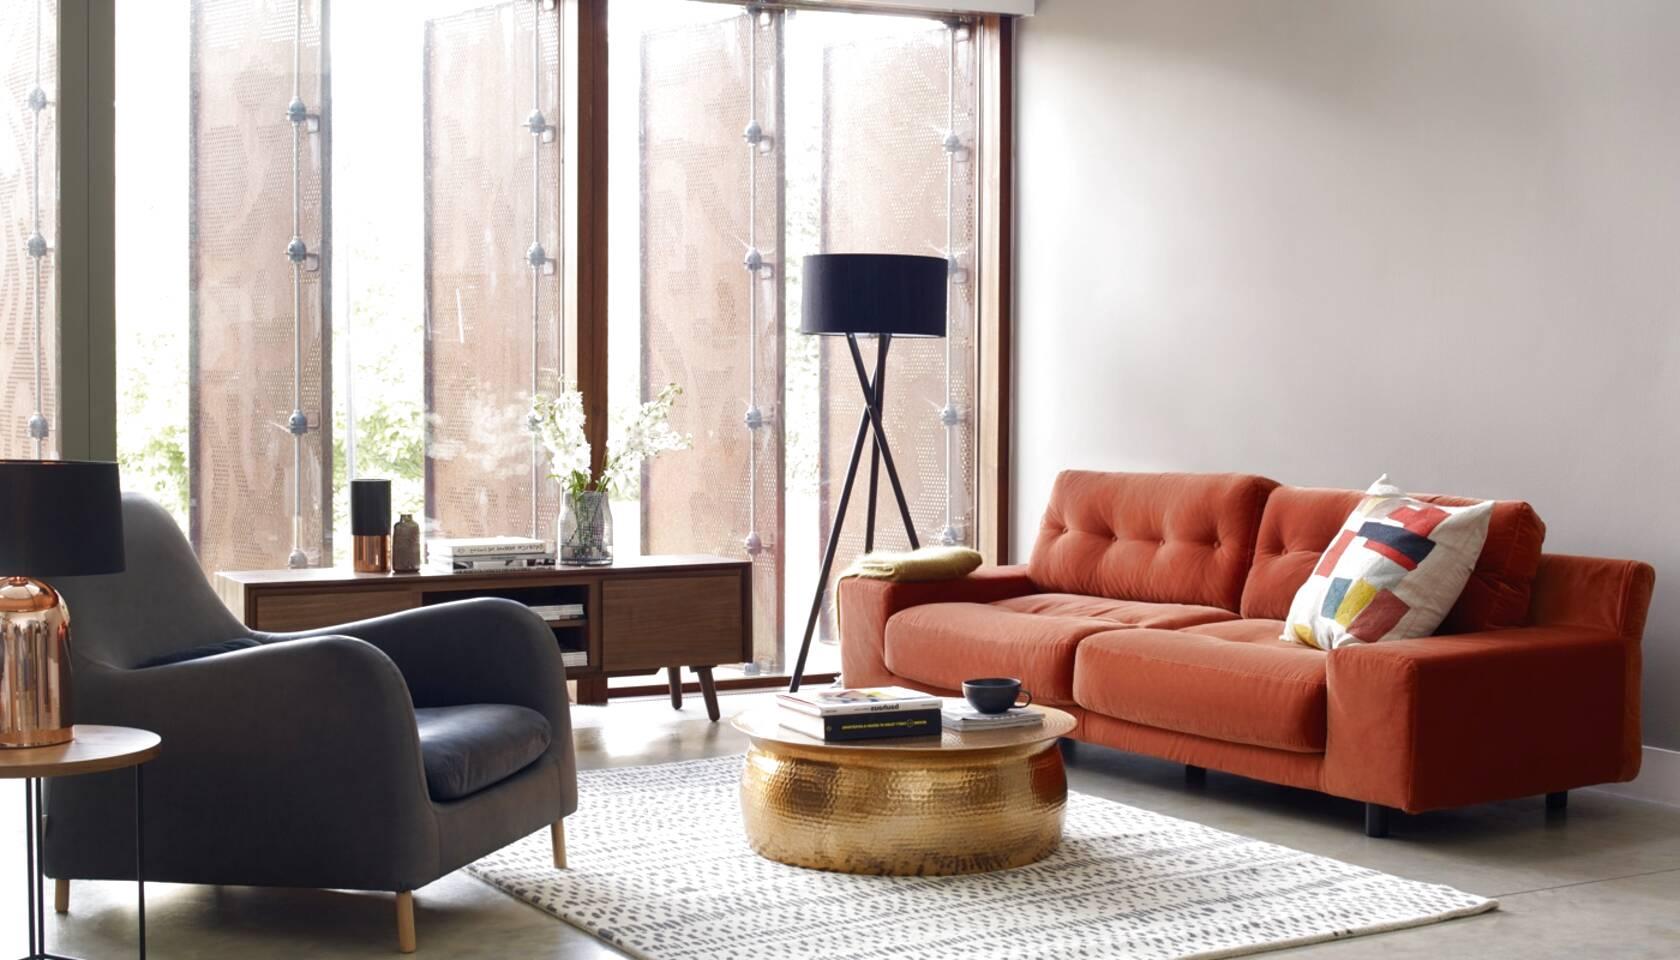 habitat furniture for sale